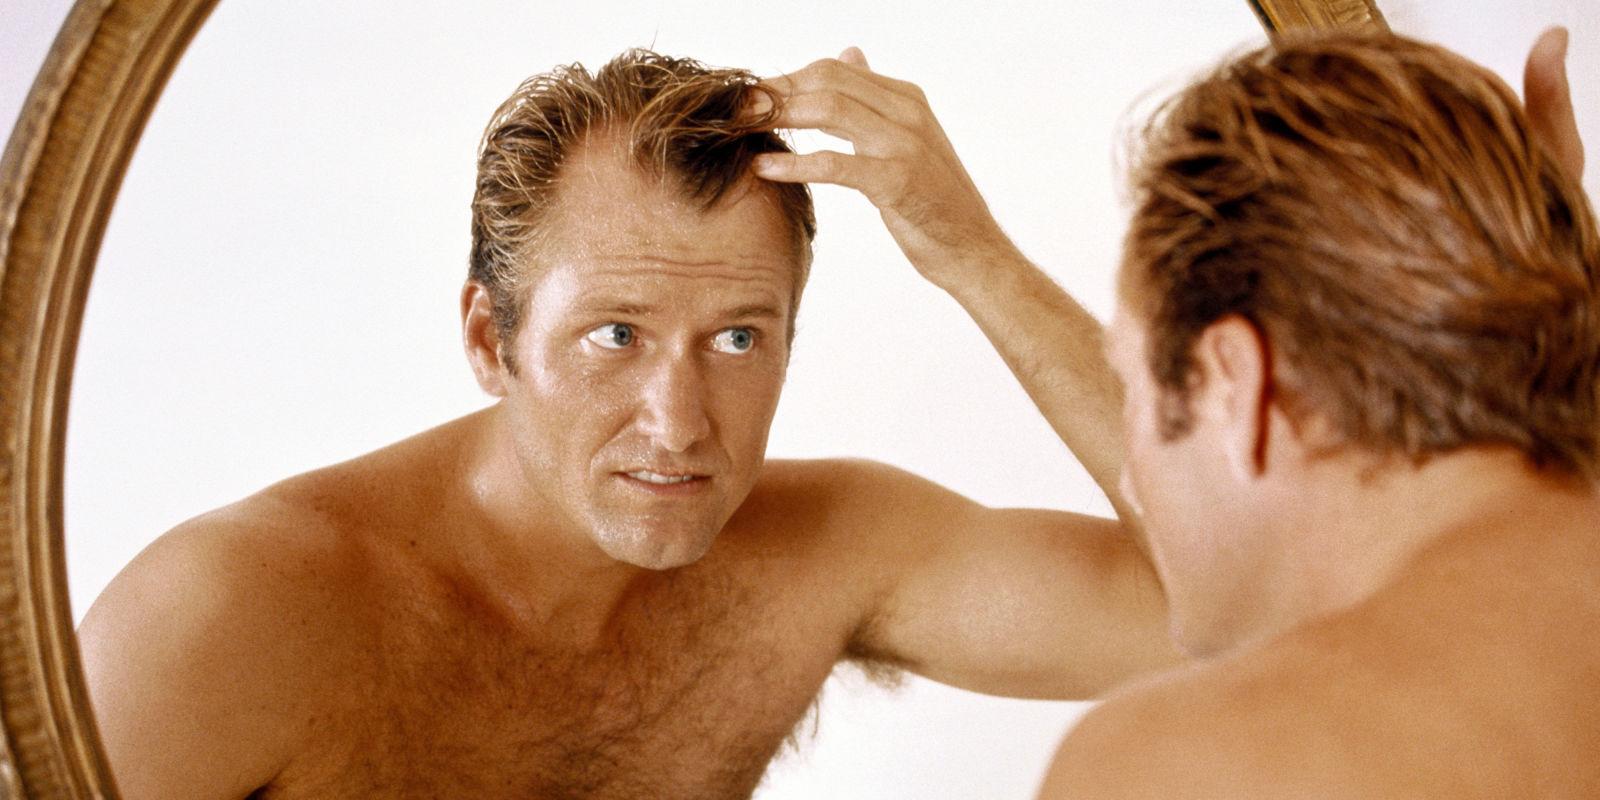 hair-loss-men05